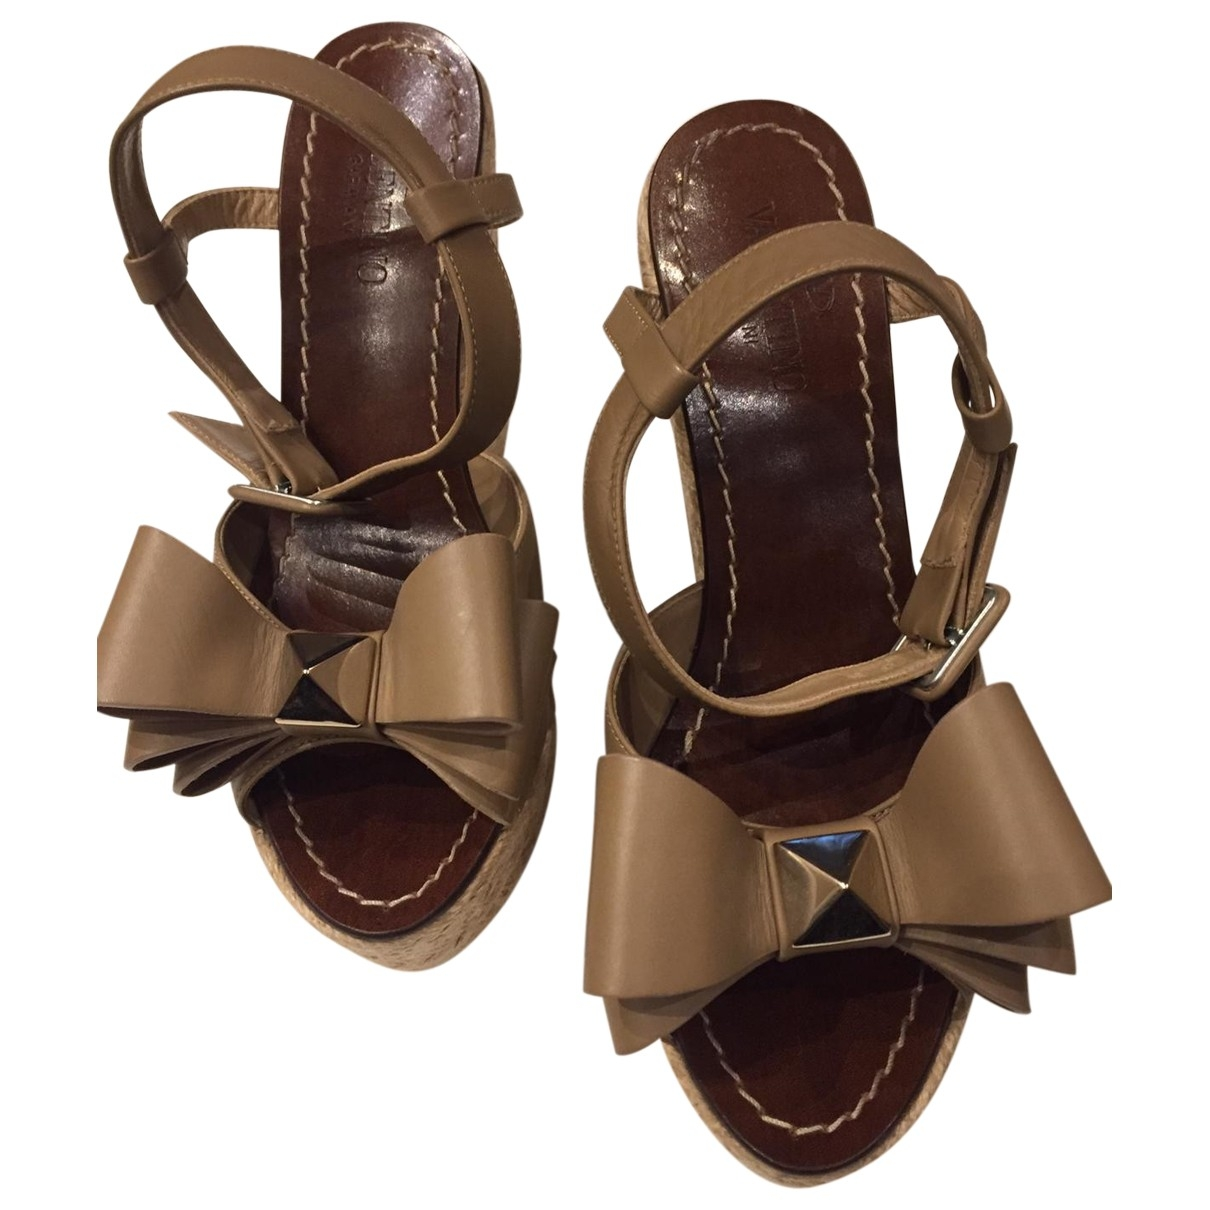 Valentino Garavani \N Beige Leather Sandals for Women 36.5 EU